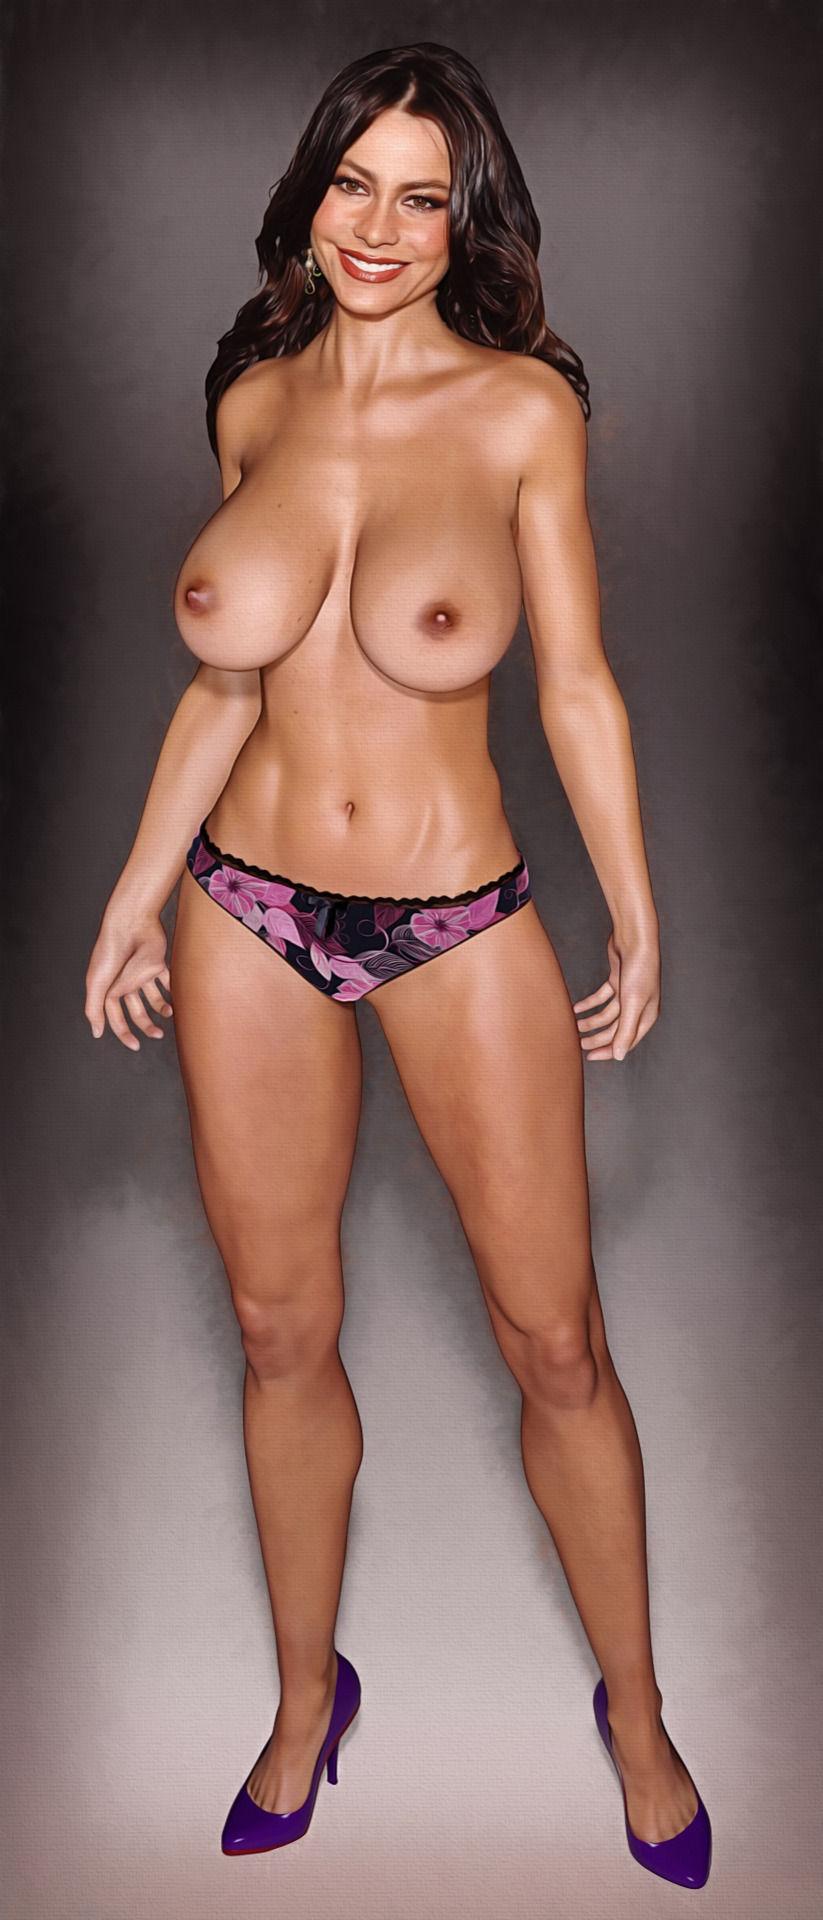 aamir khan nude naked pics